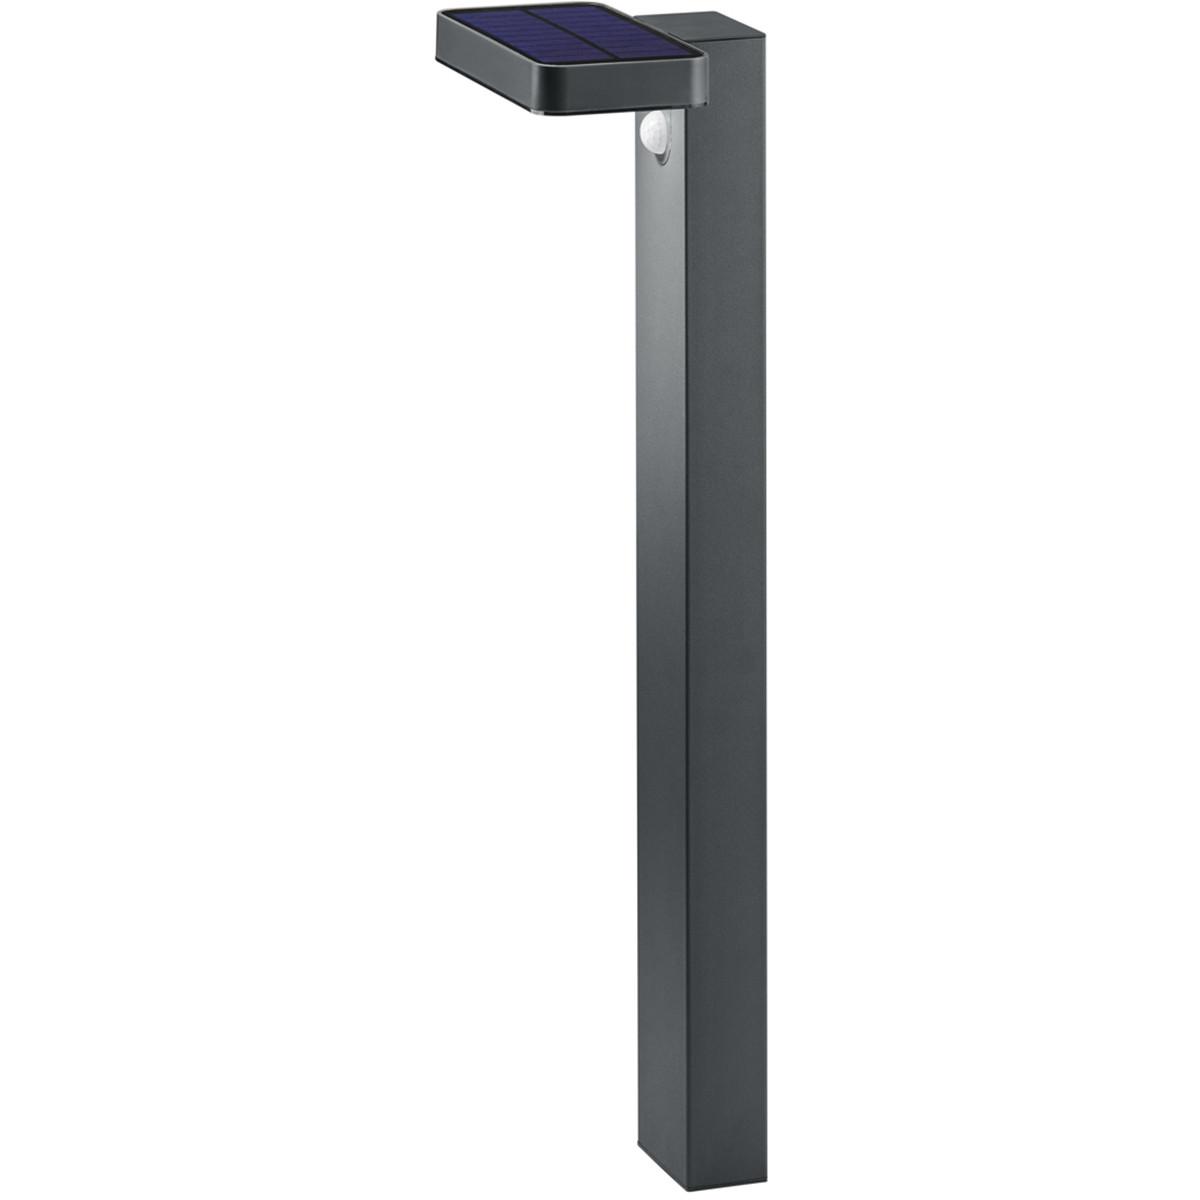 LED Solar Tuinverlichting - Paal/Sokkel - Trion Escarino - Zonne-energie - Bewegingssensor - 4W - Ma